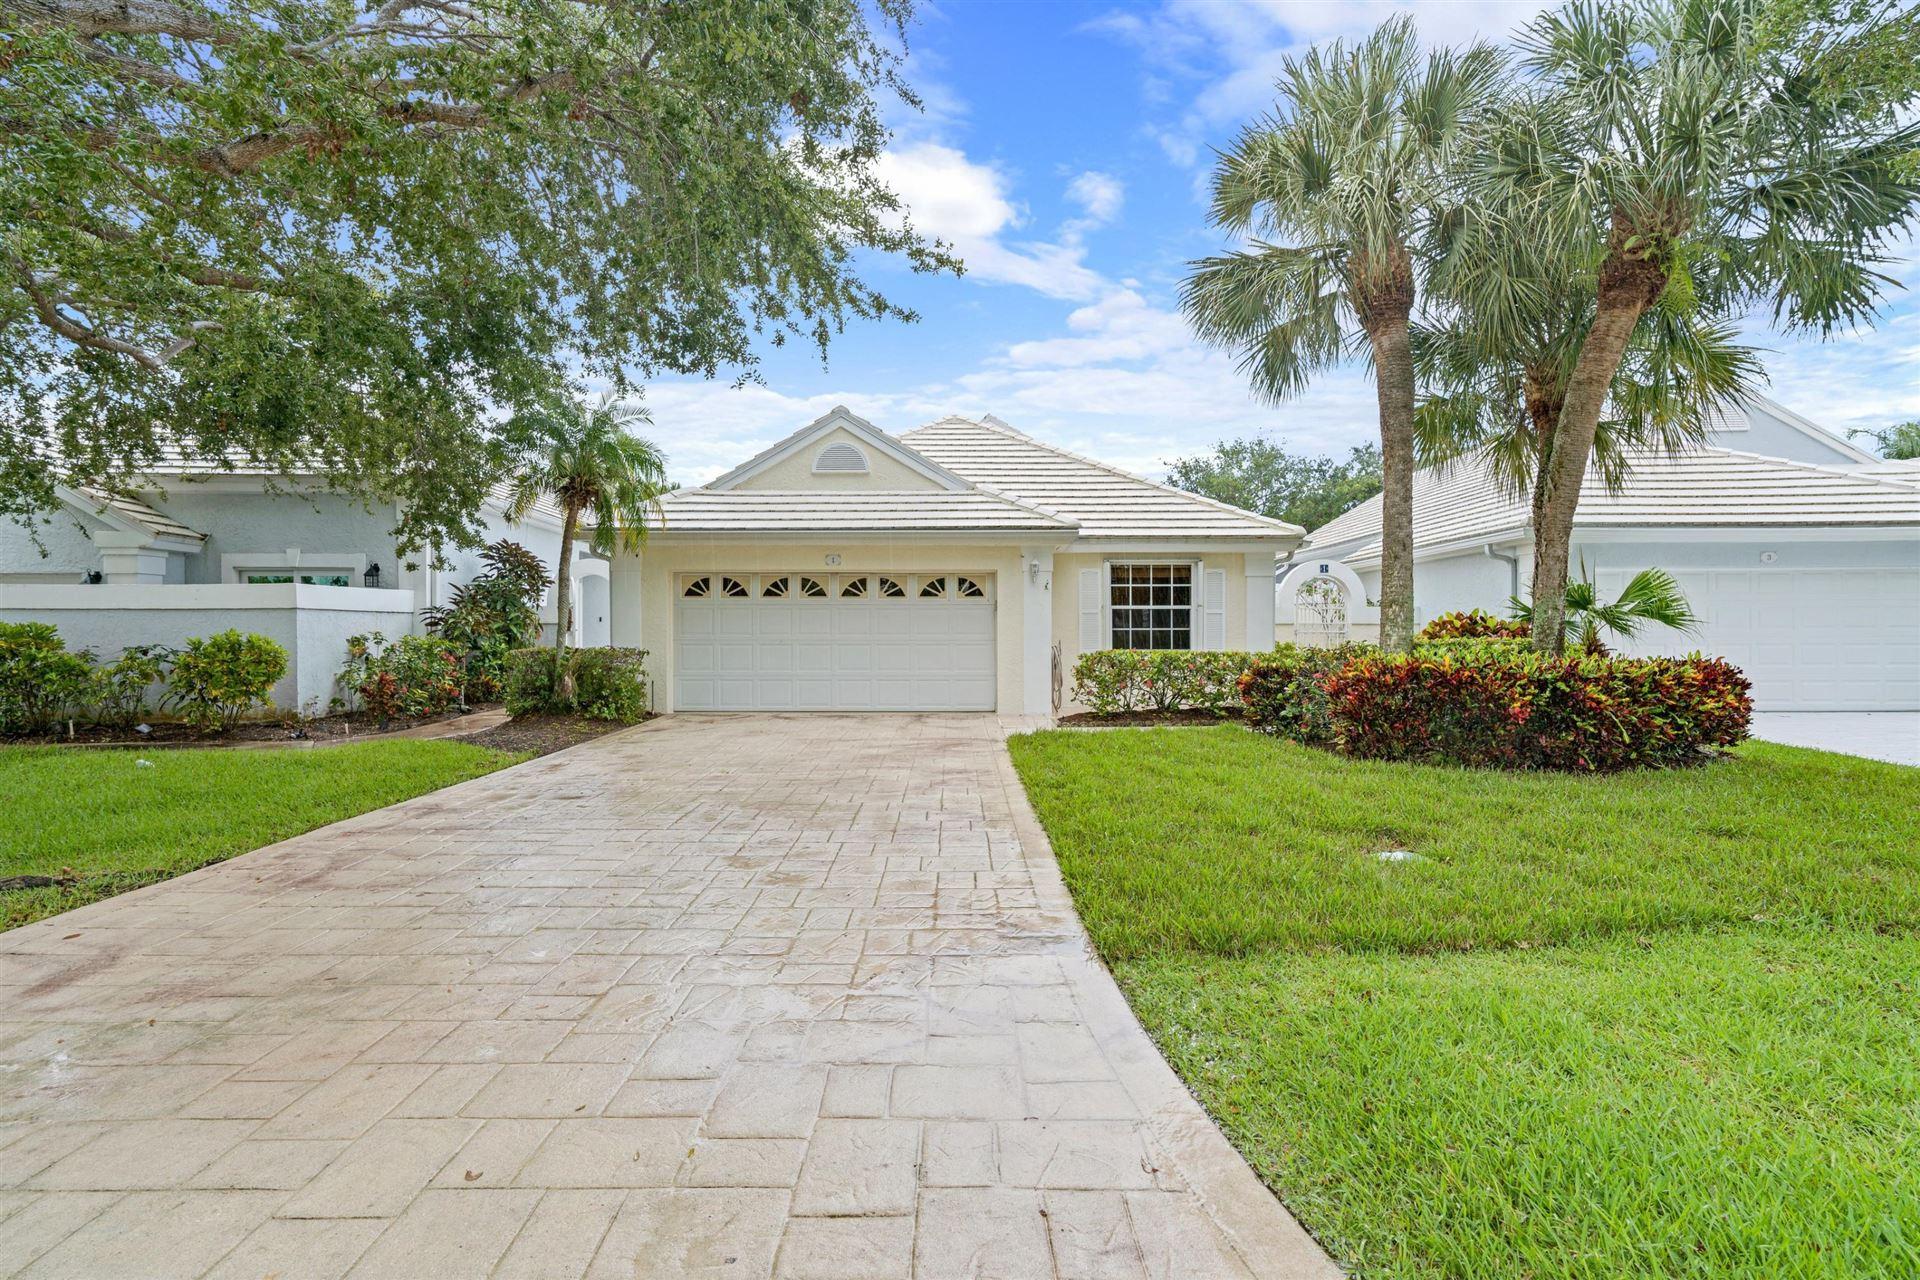 Photo of 1 Blenheim Court, Palm Beach Gardens, FL 33418 (MLS # RX-10731729)